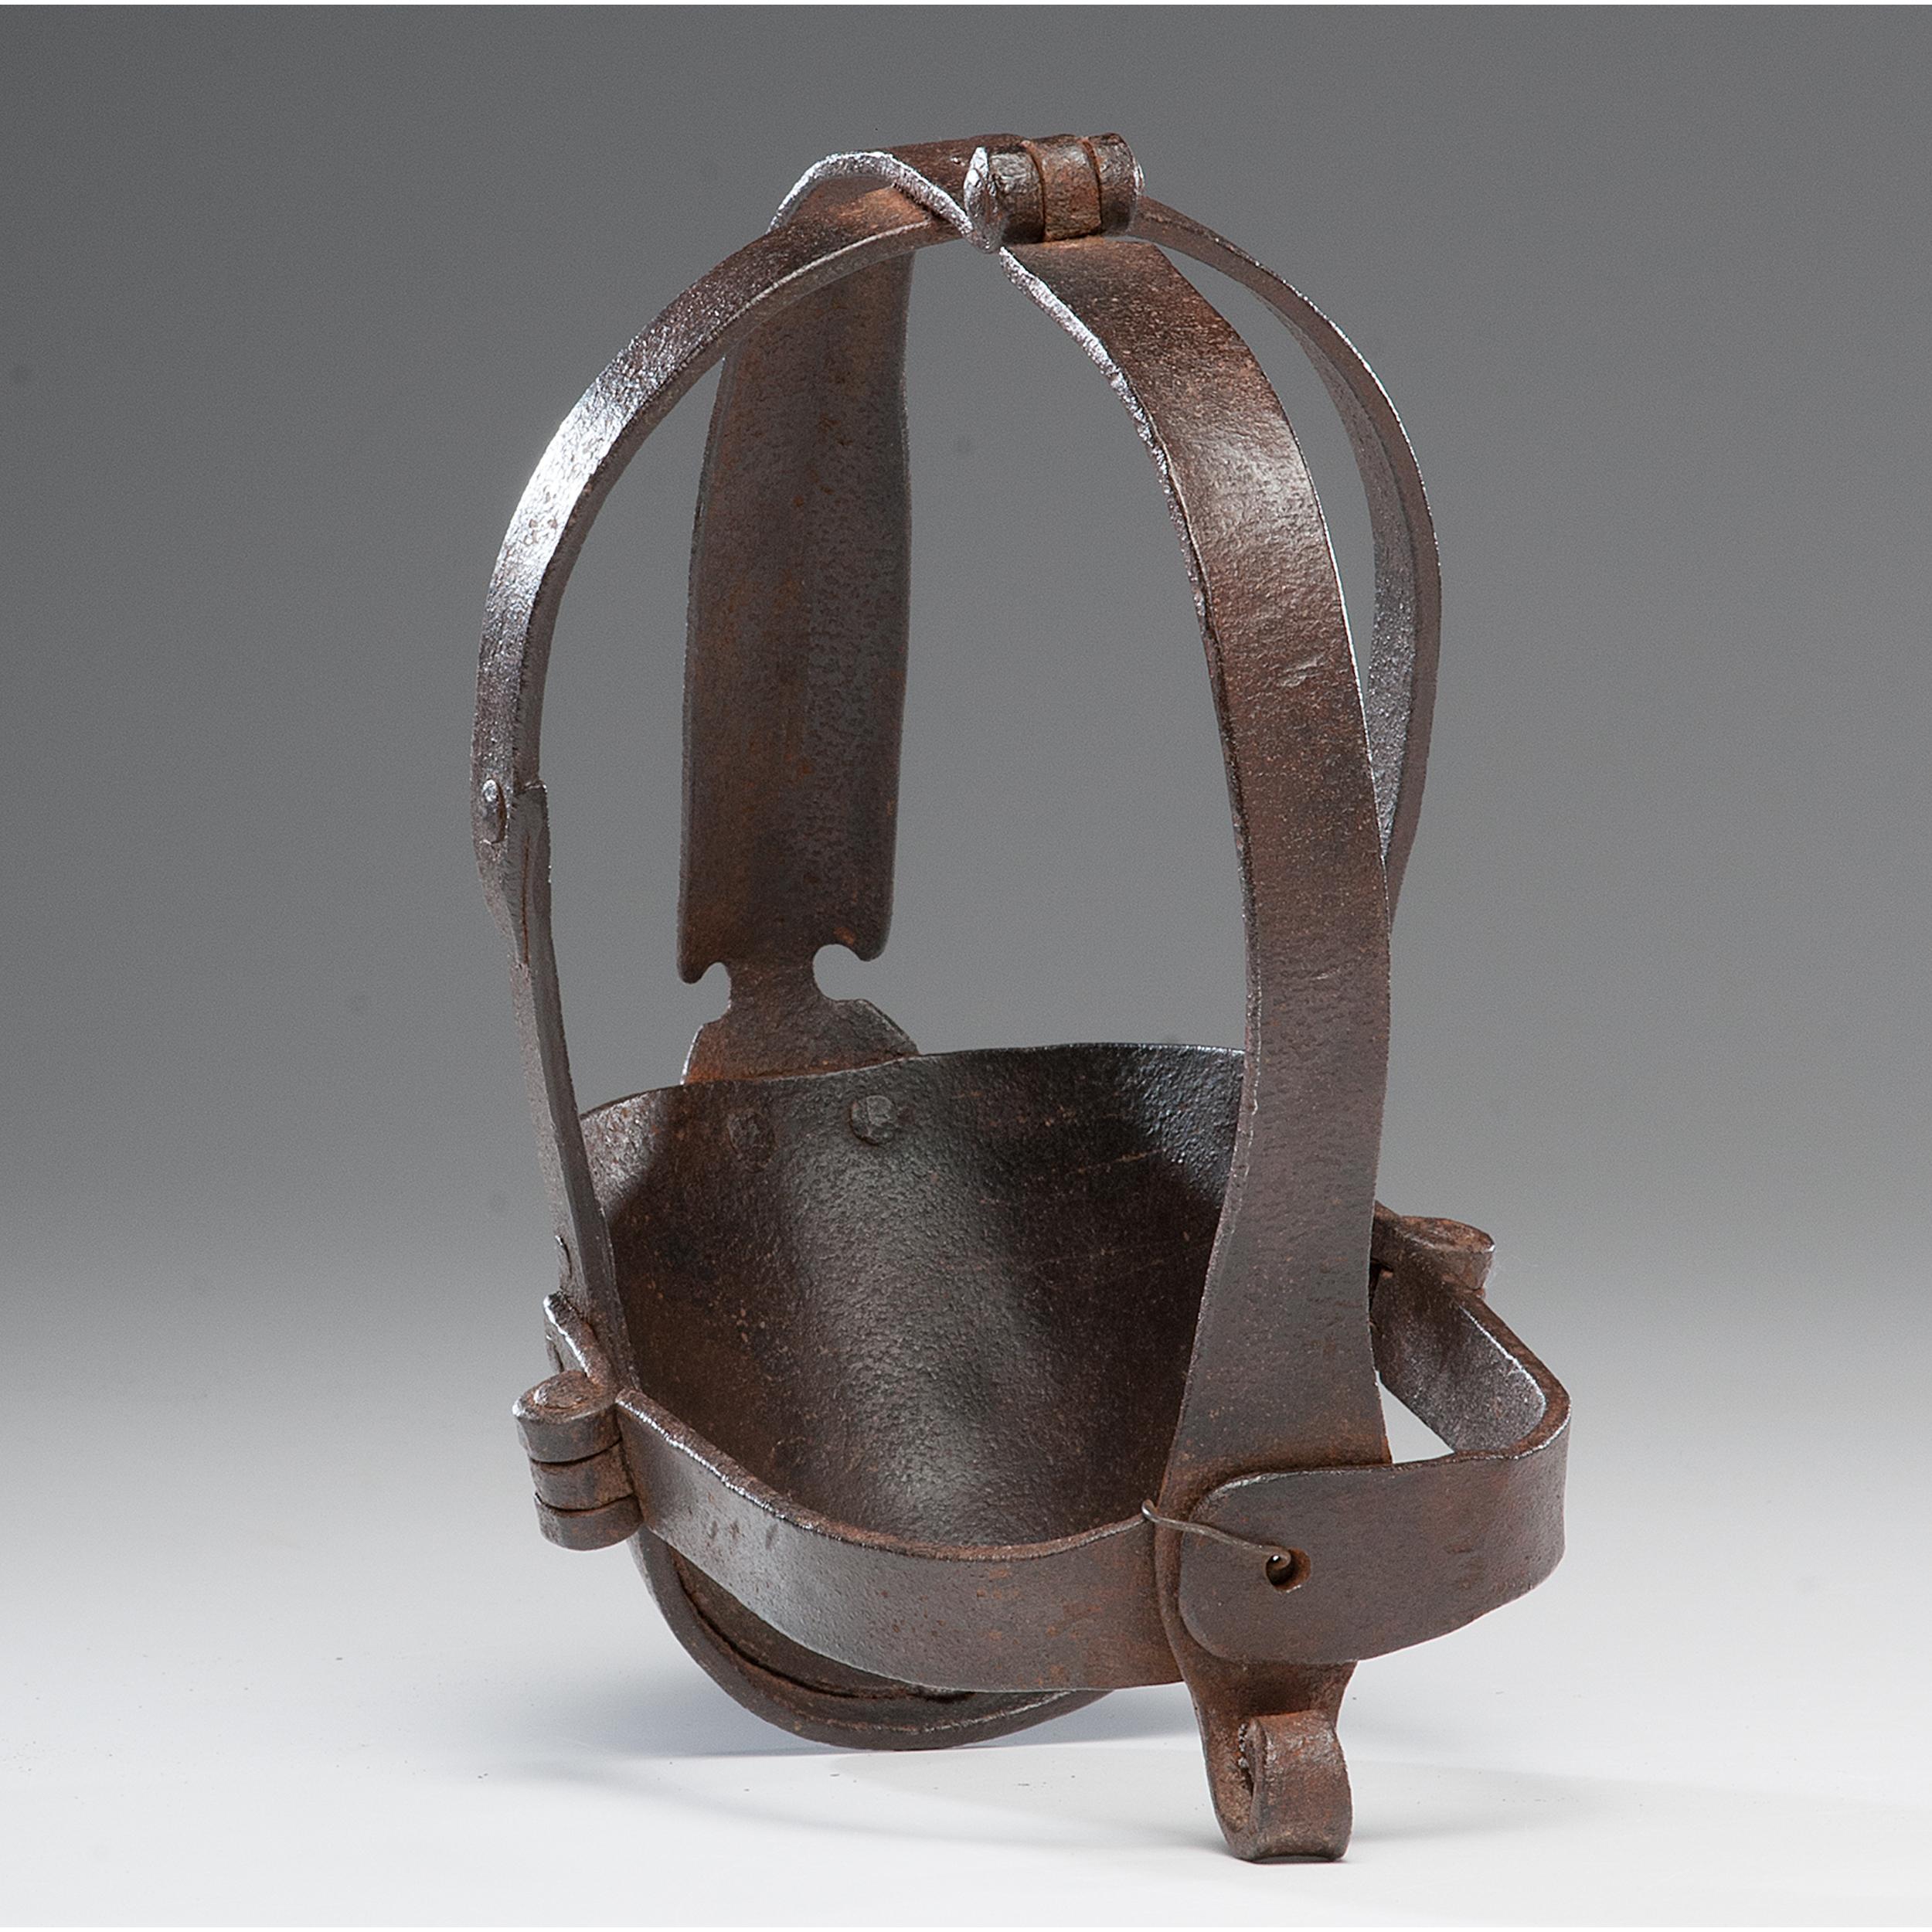 Slave Mask Ca 1840 1850 Cowan S Auction House The